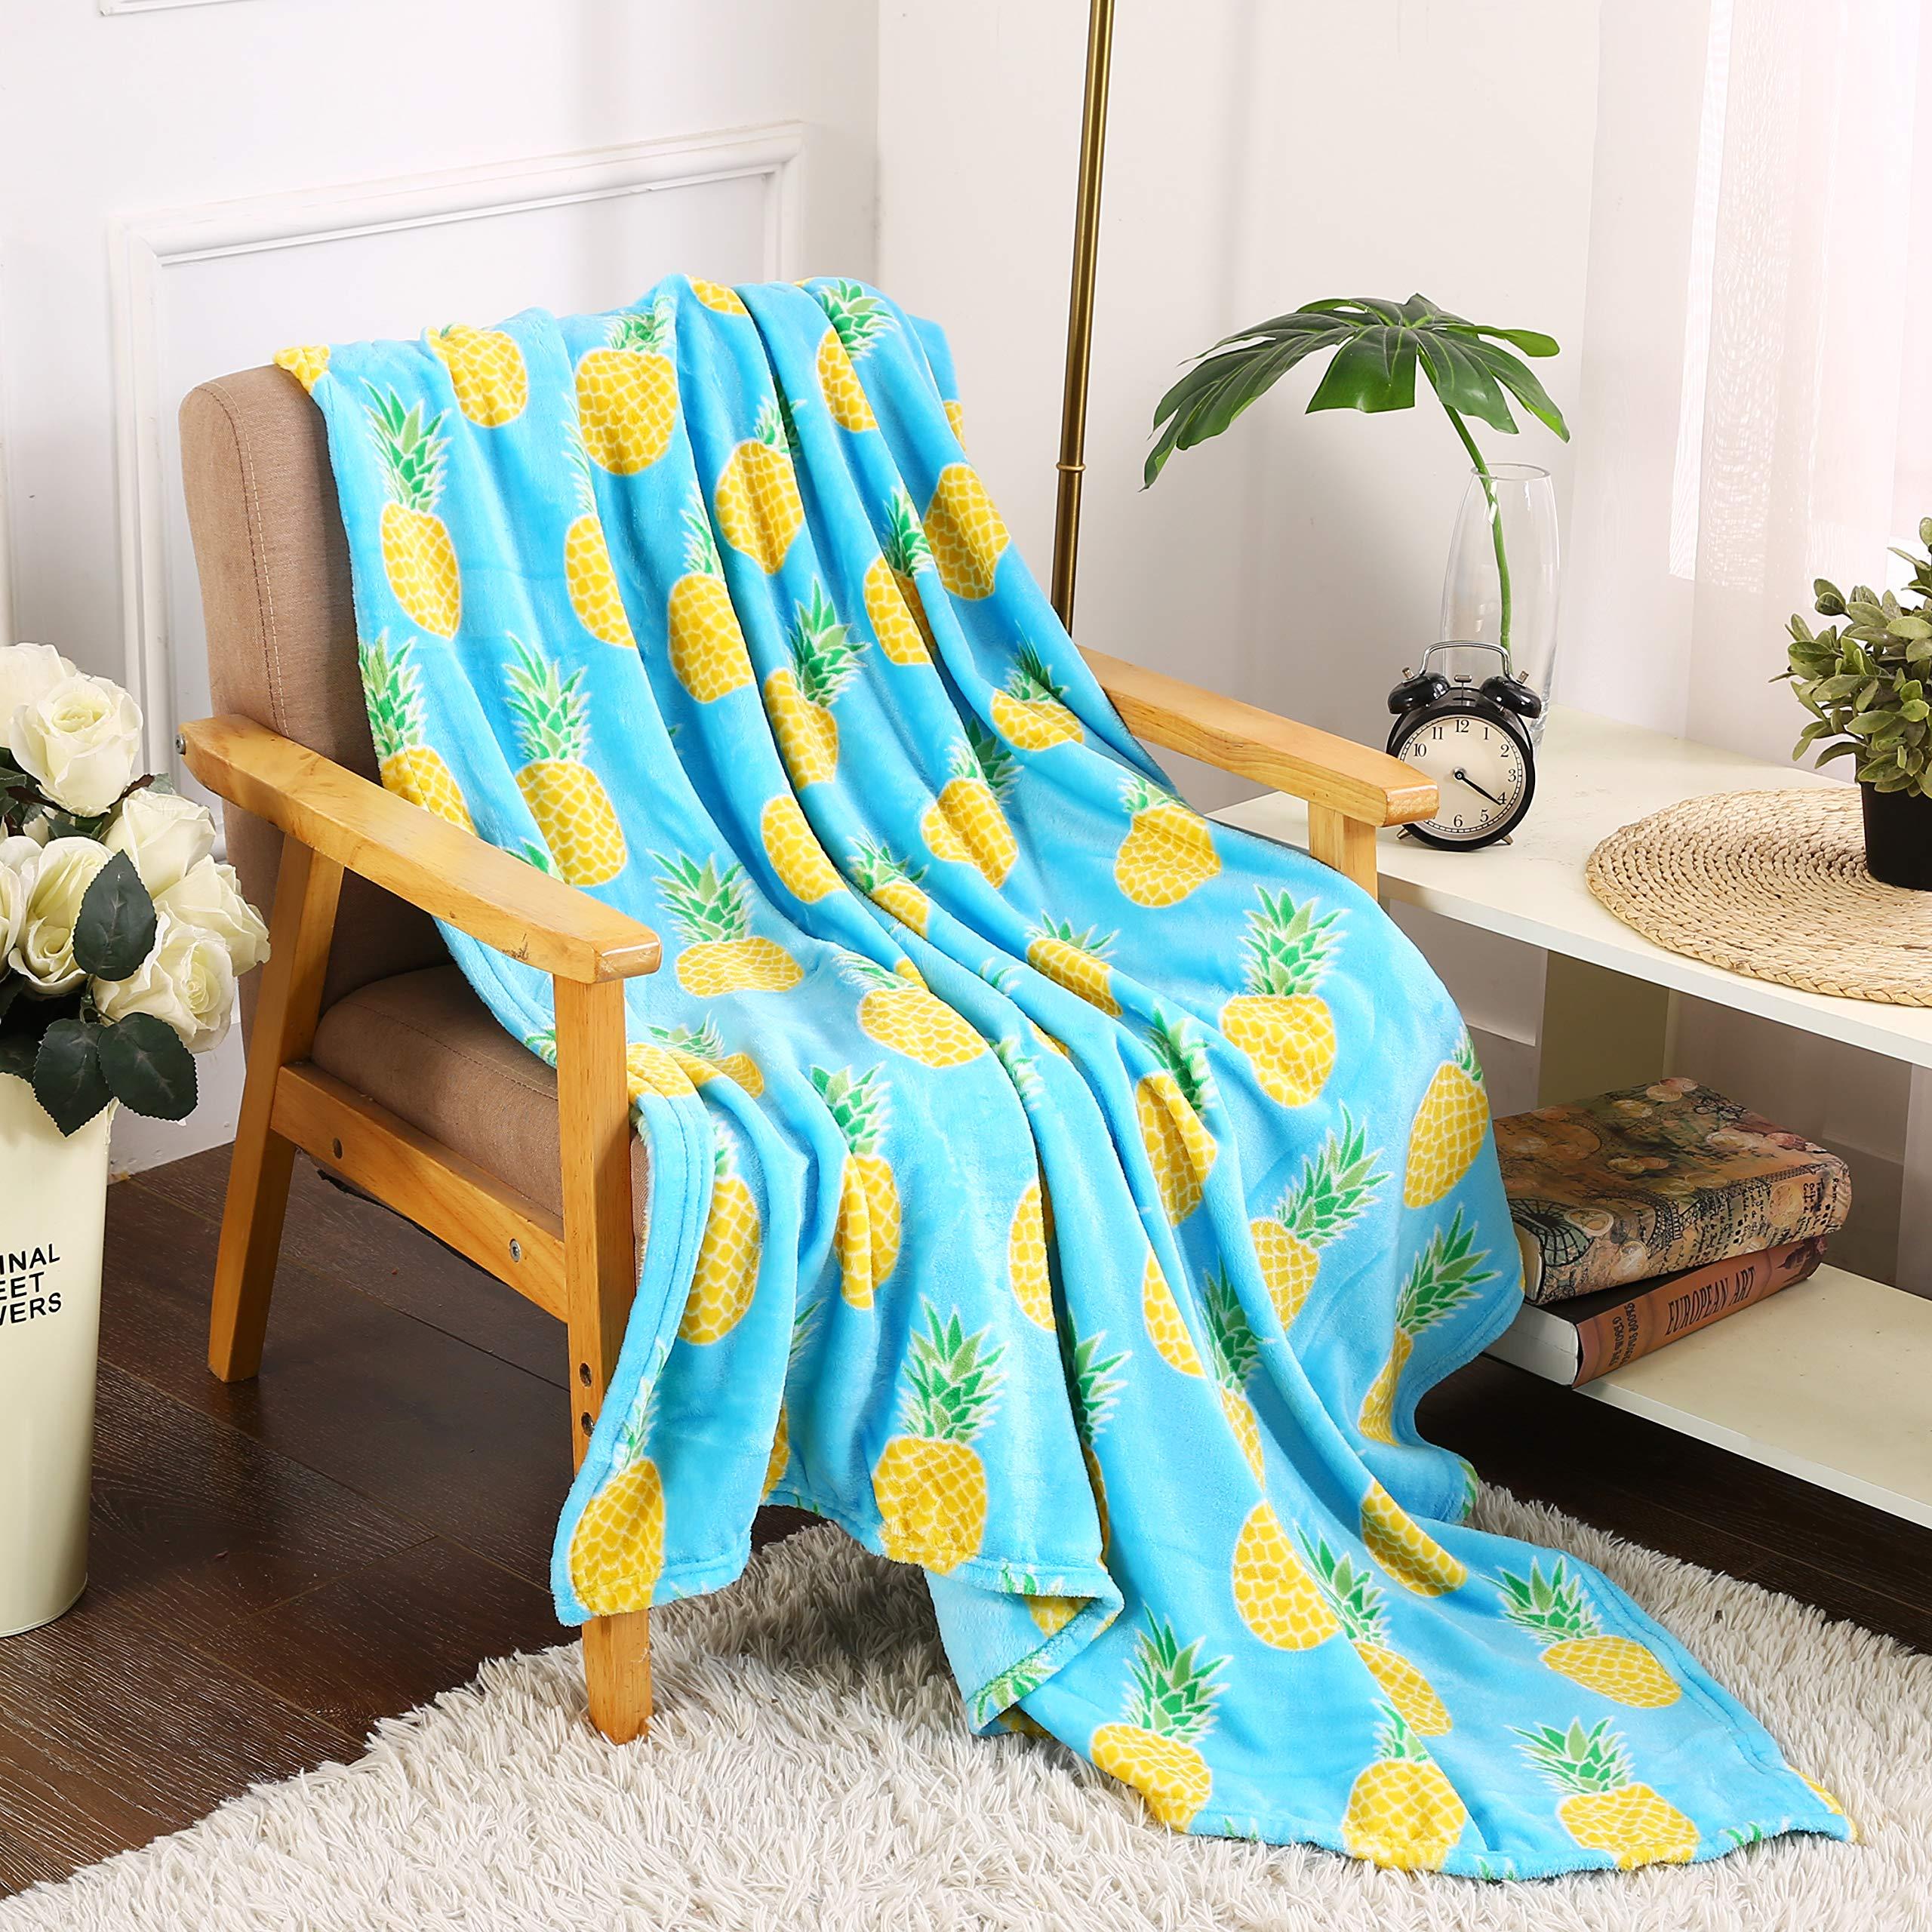 SummerTime Whimsy Plush Fleece Throw Blanket (50'' x 60'') - Pineapple by Décor&More (Image #4)